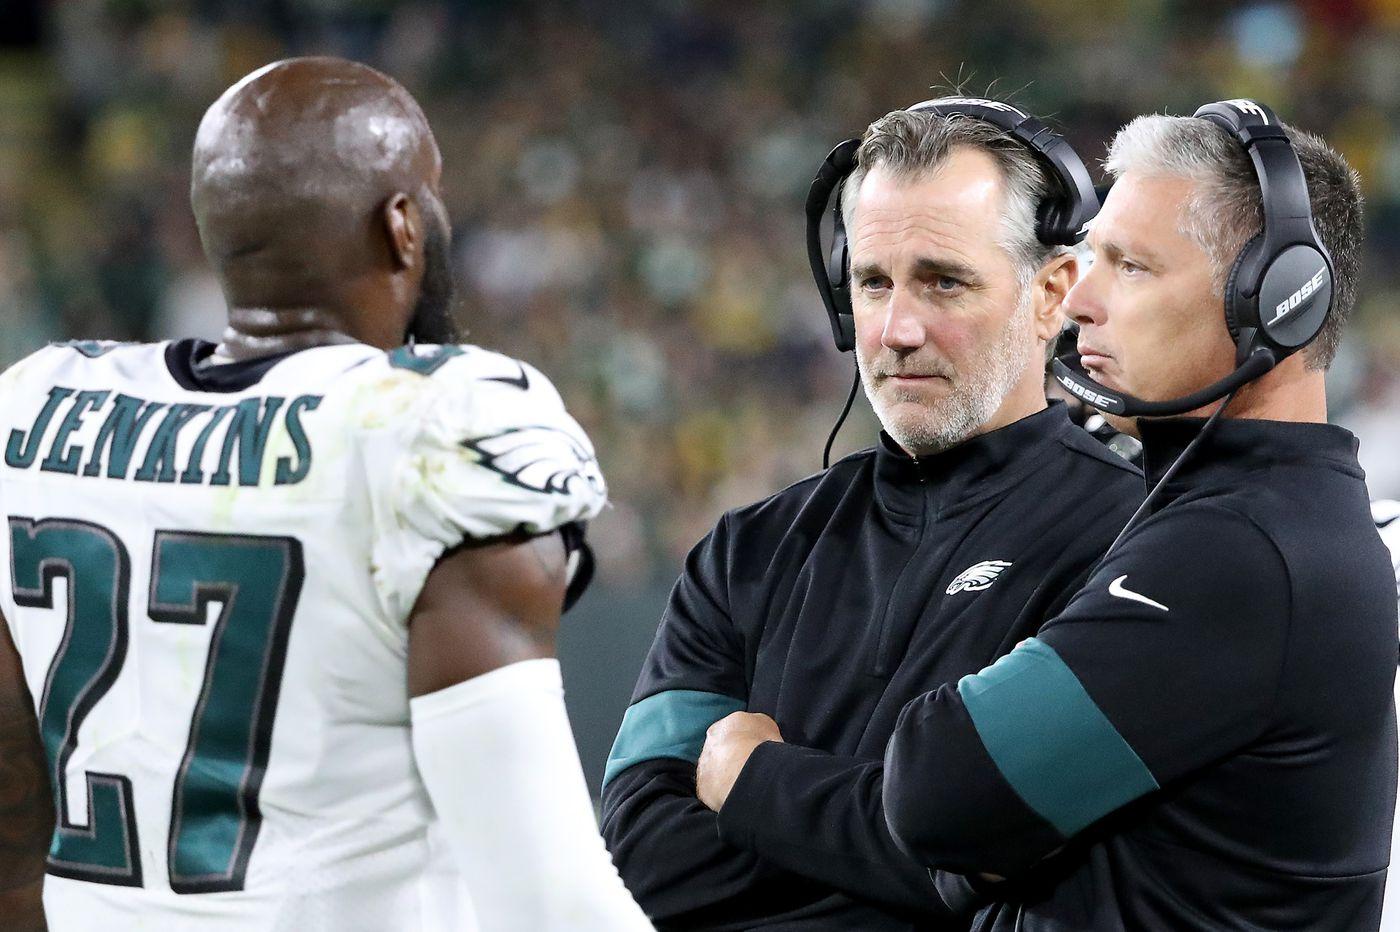 Eagles assistant Cory Undlin named Lions' defensive coordinator